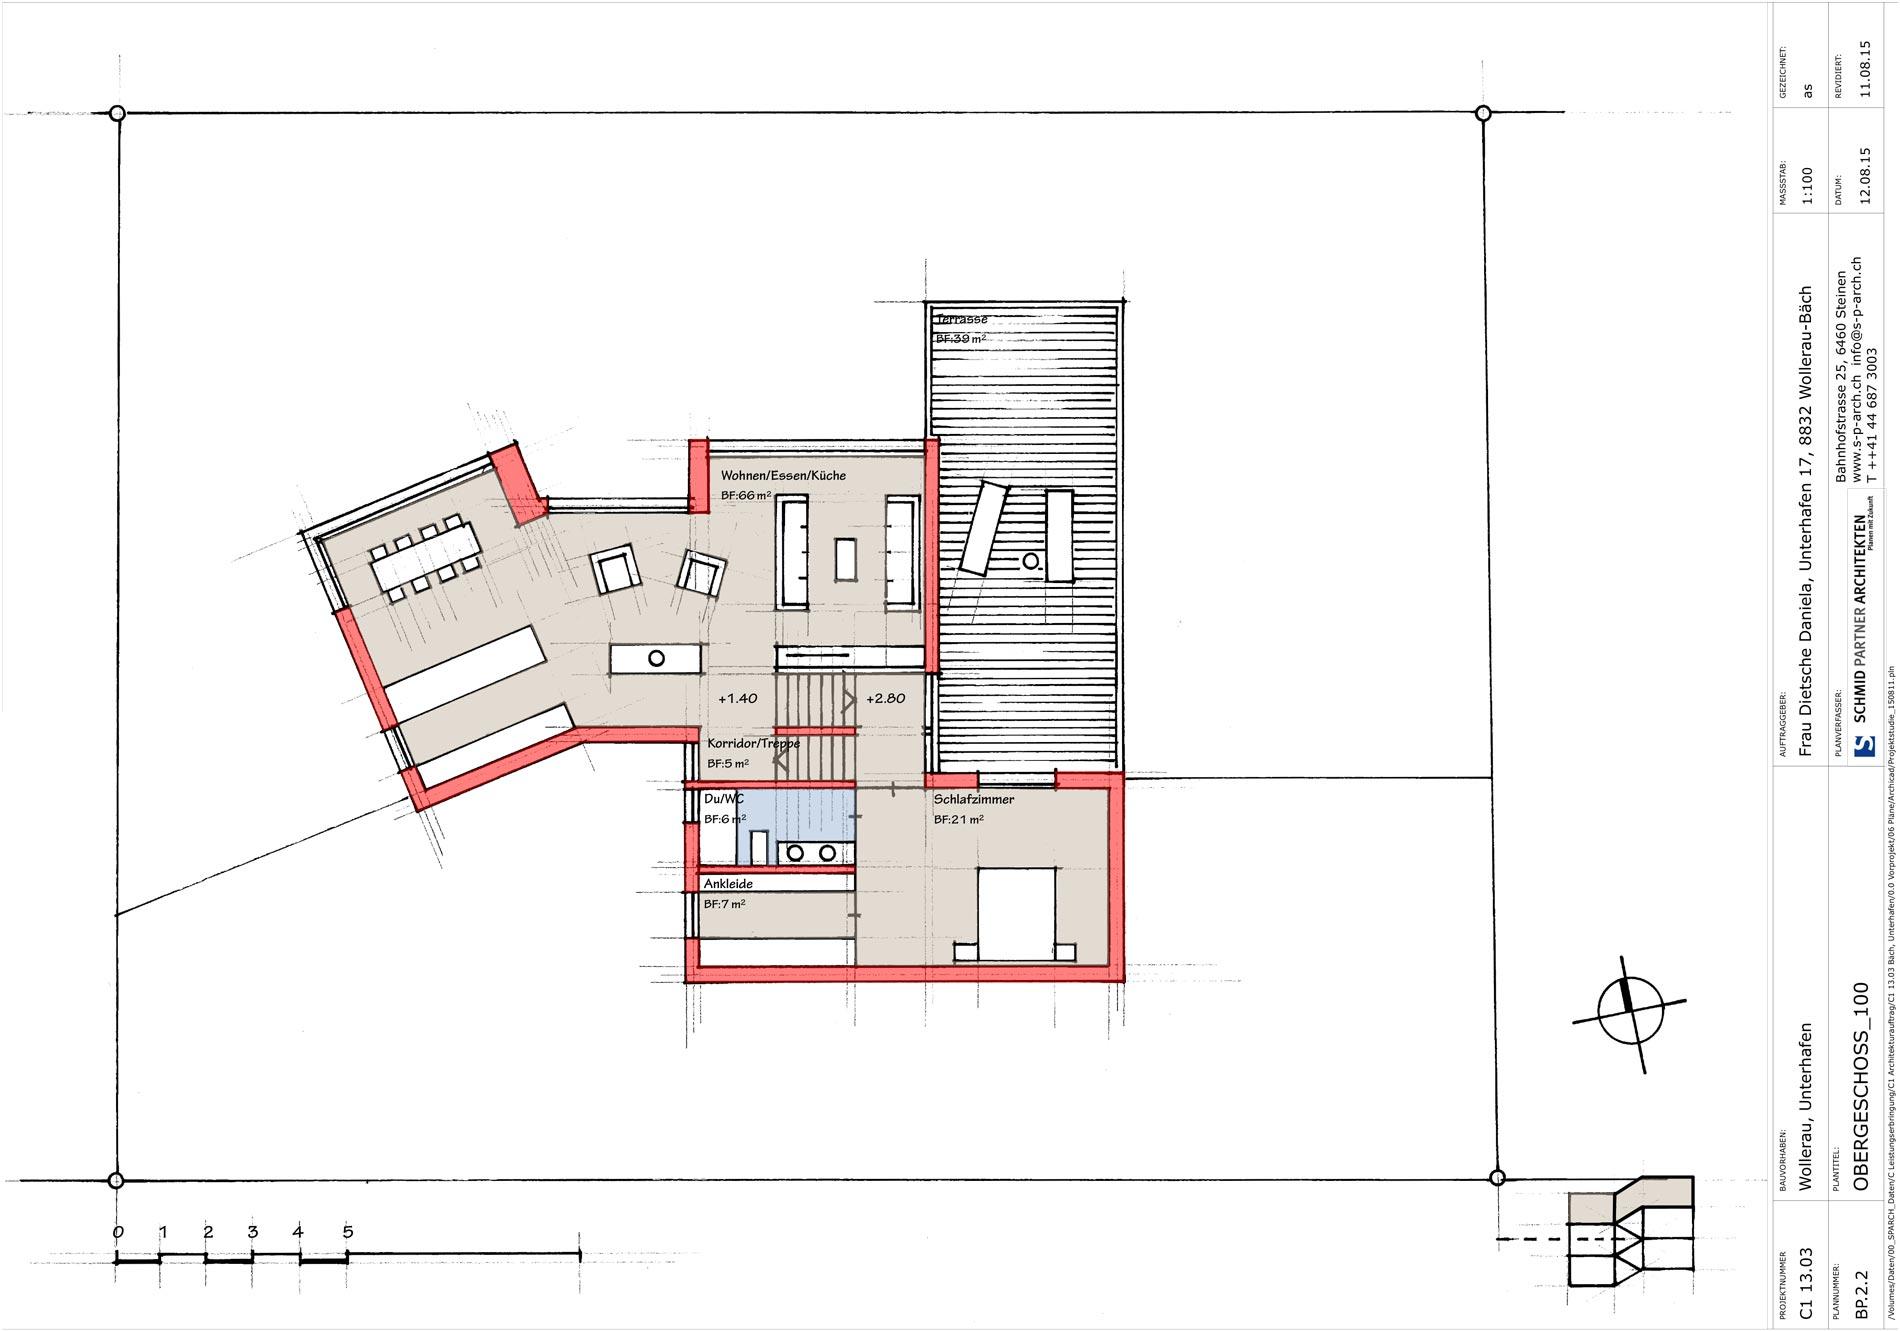 Schmid Partner Architekten Umbau C11505 BP.2.2 OBERGESCHOSS 100